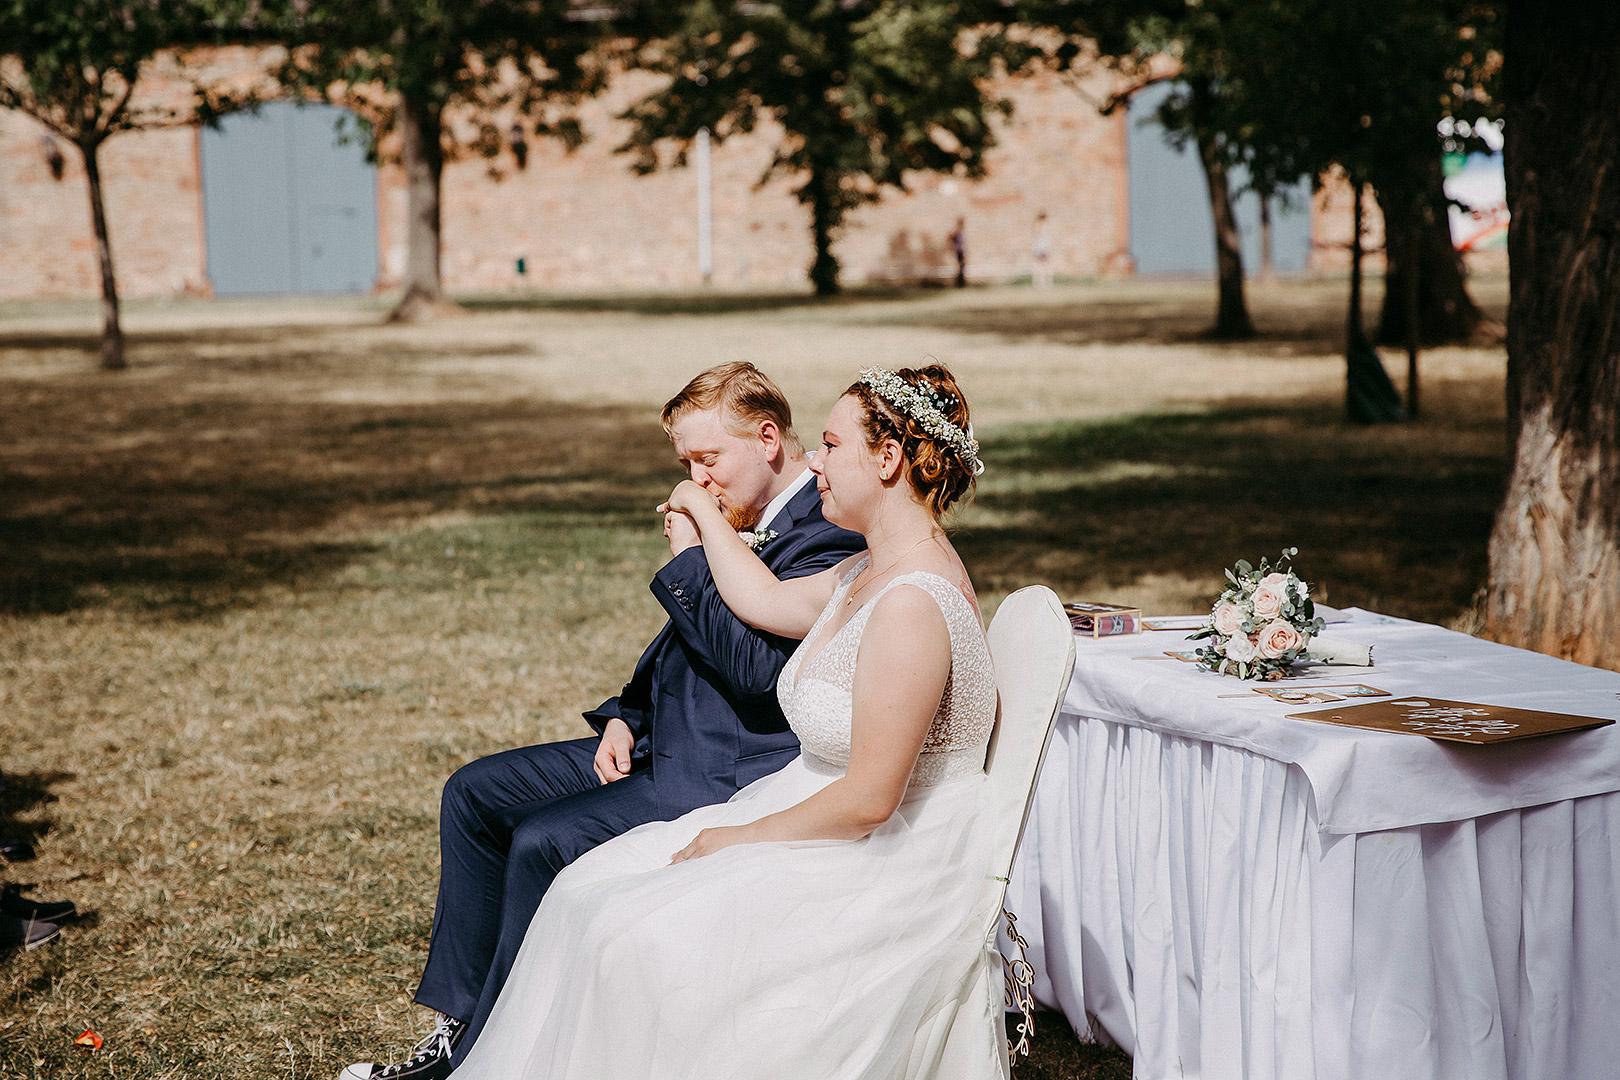 portrait_wedding_kathrinundpatrick_20